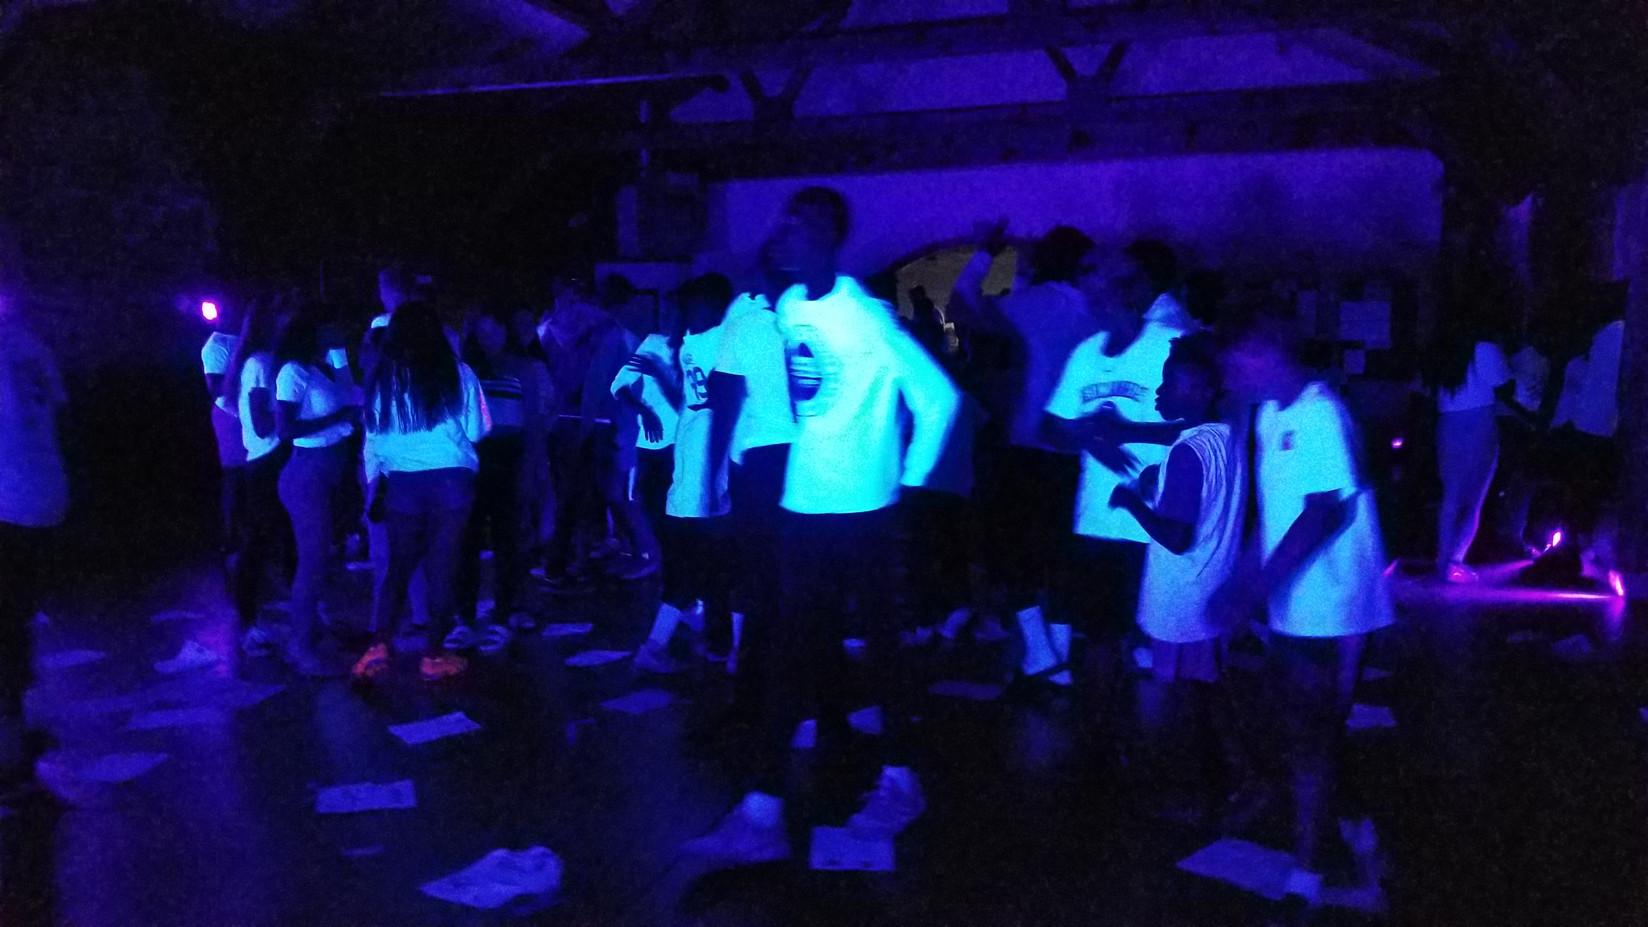 Black-Light-UV-Glow-Party-For-Teens.jpg